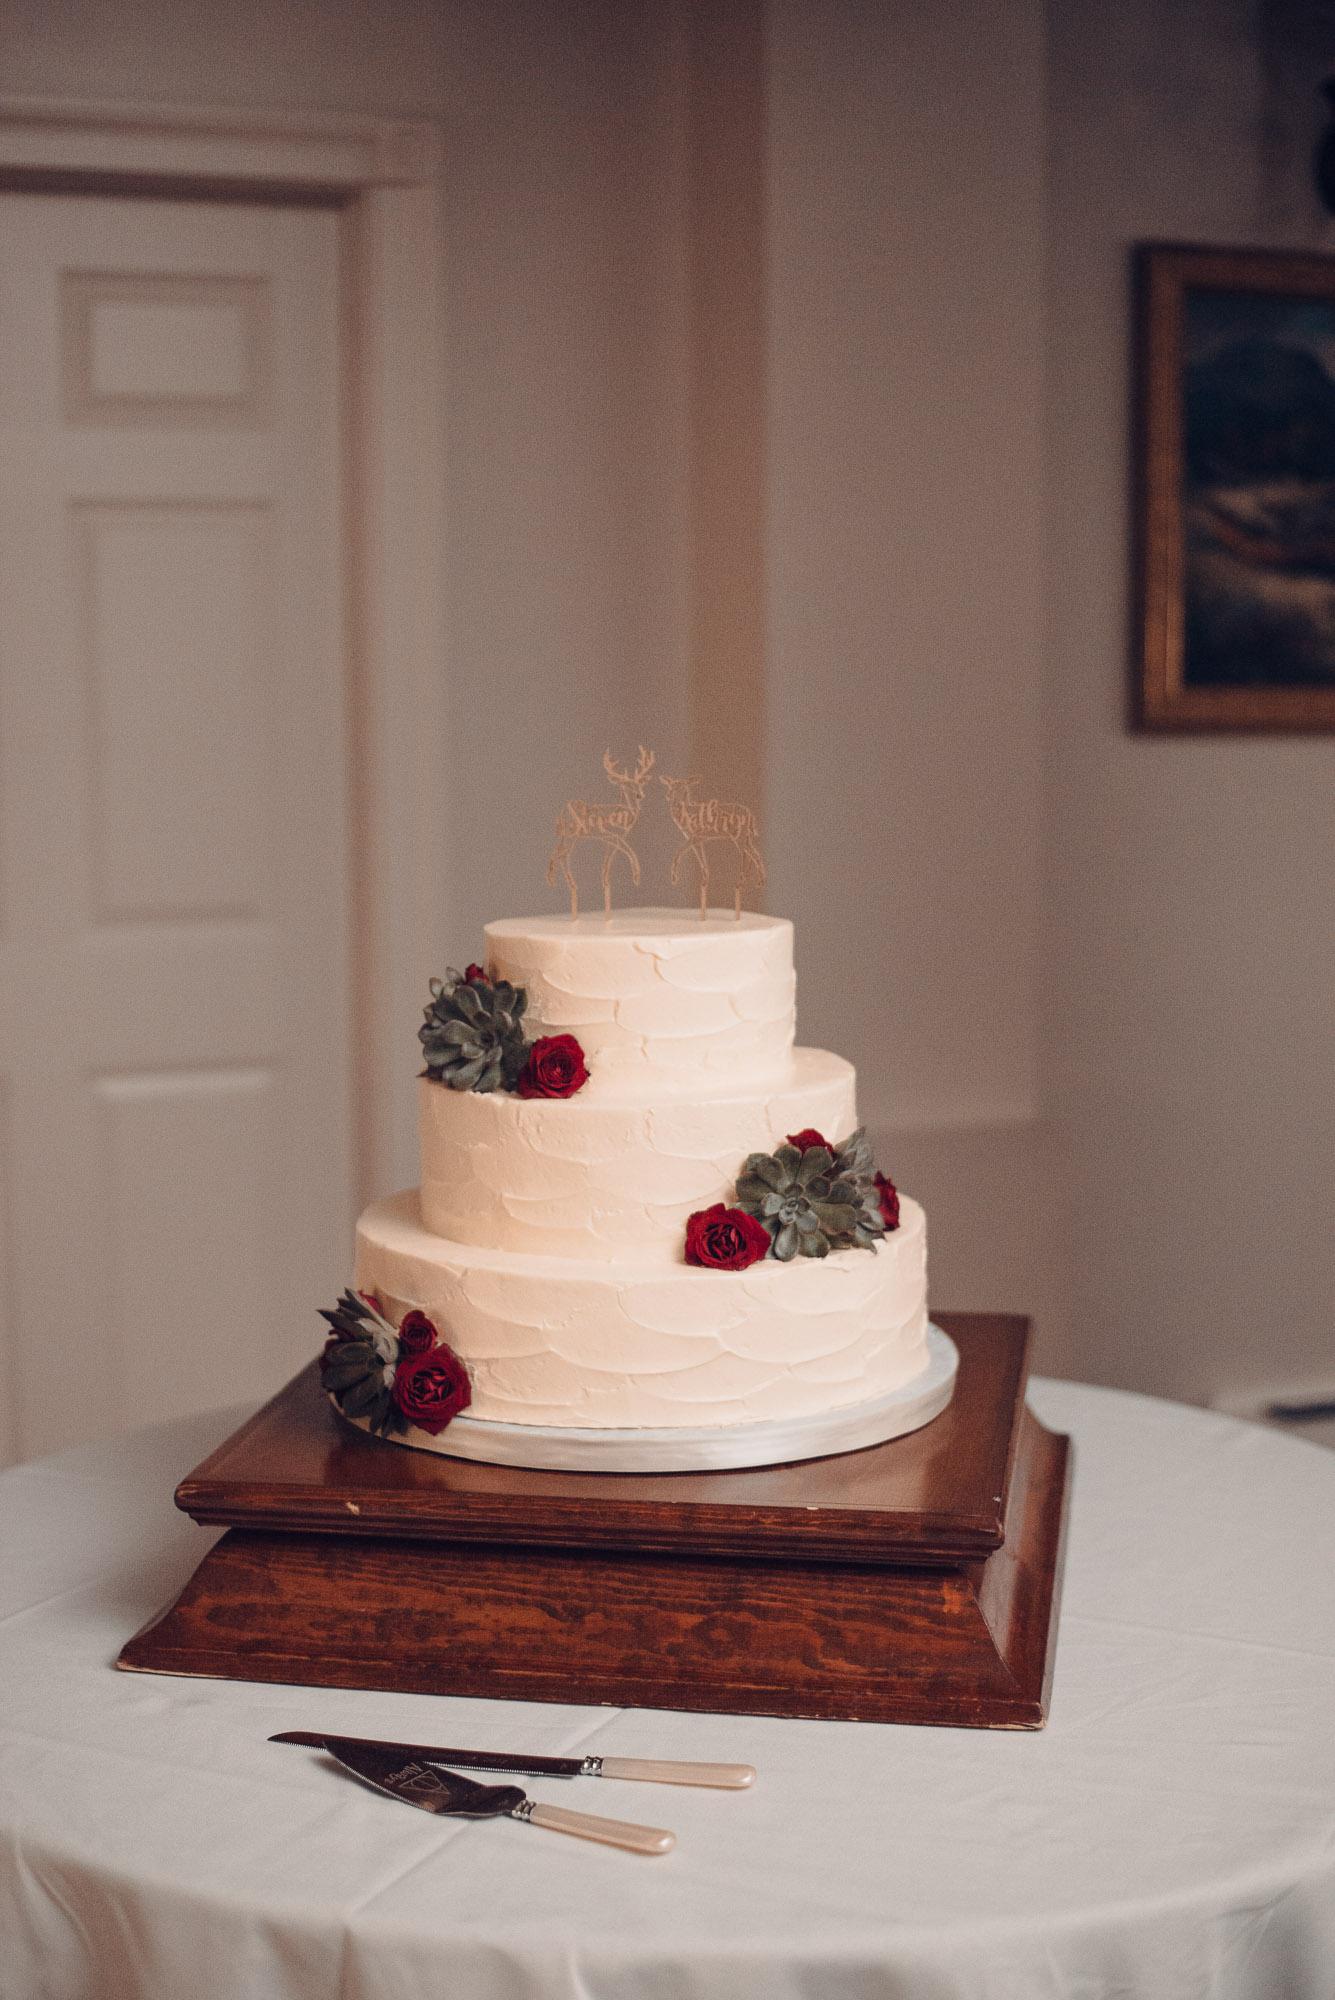 woodwinds_wedding_171020_web-26.jpg